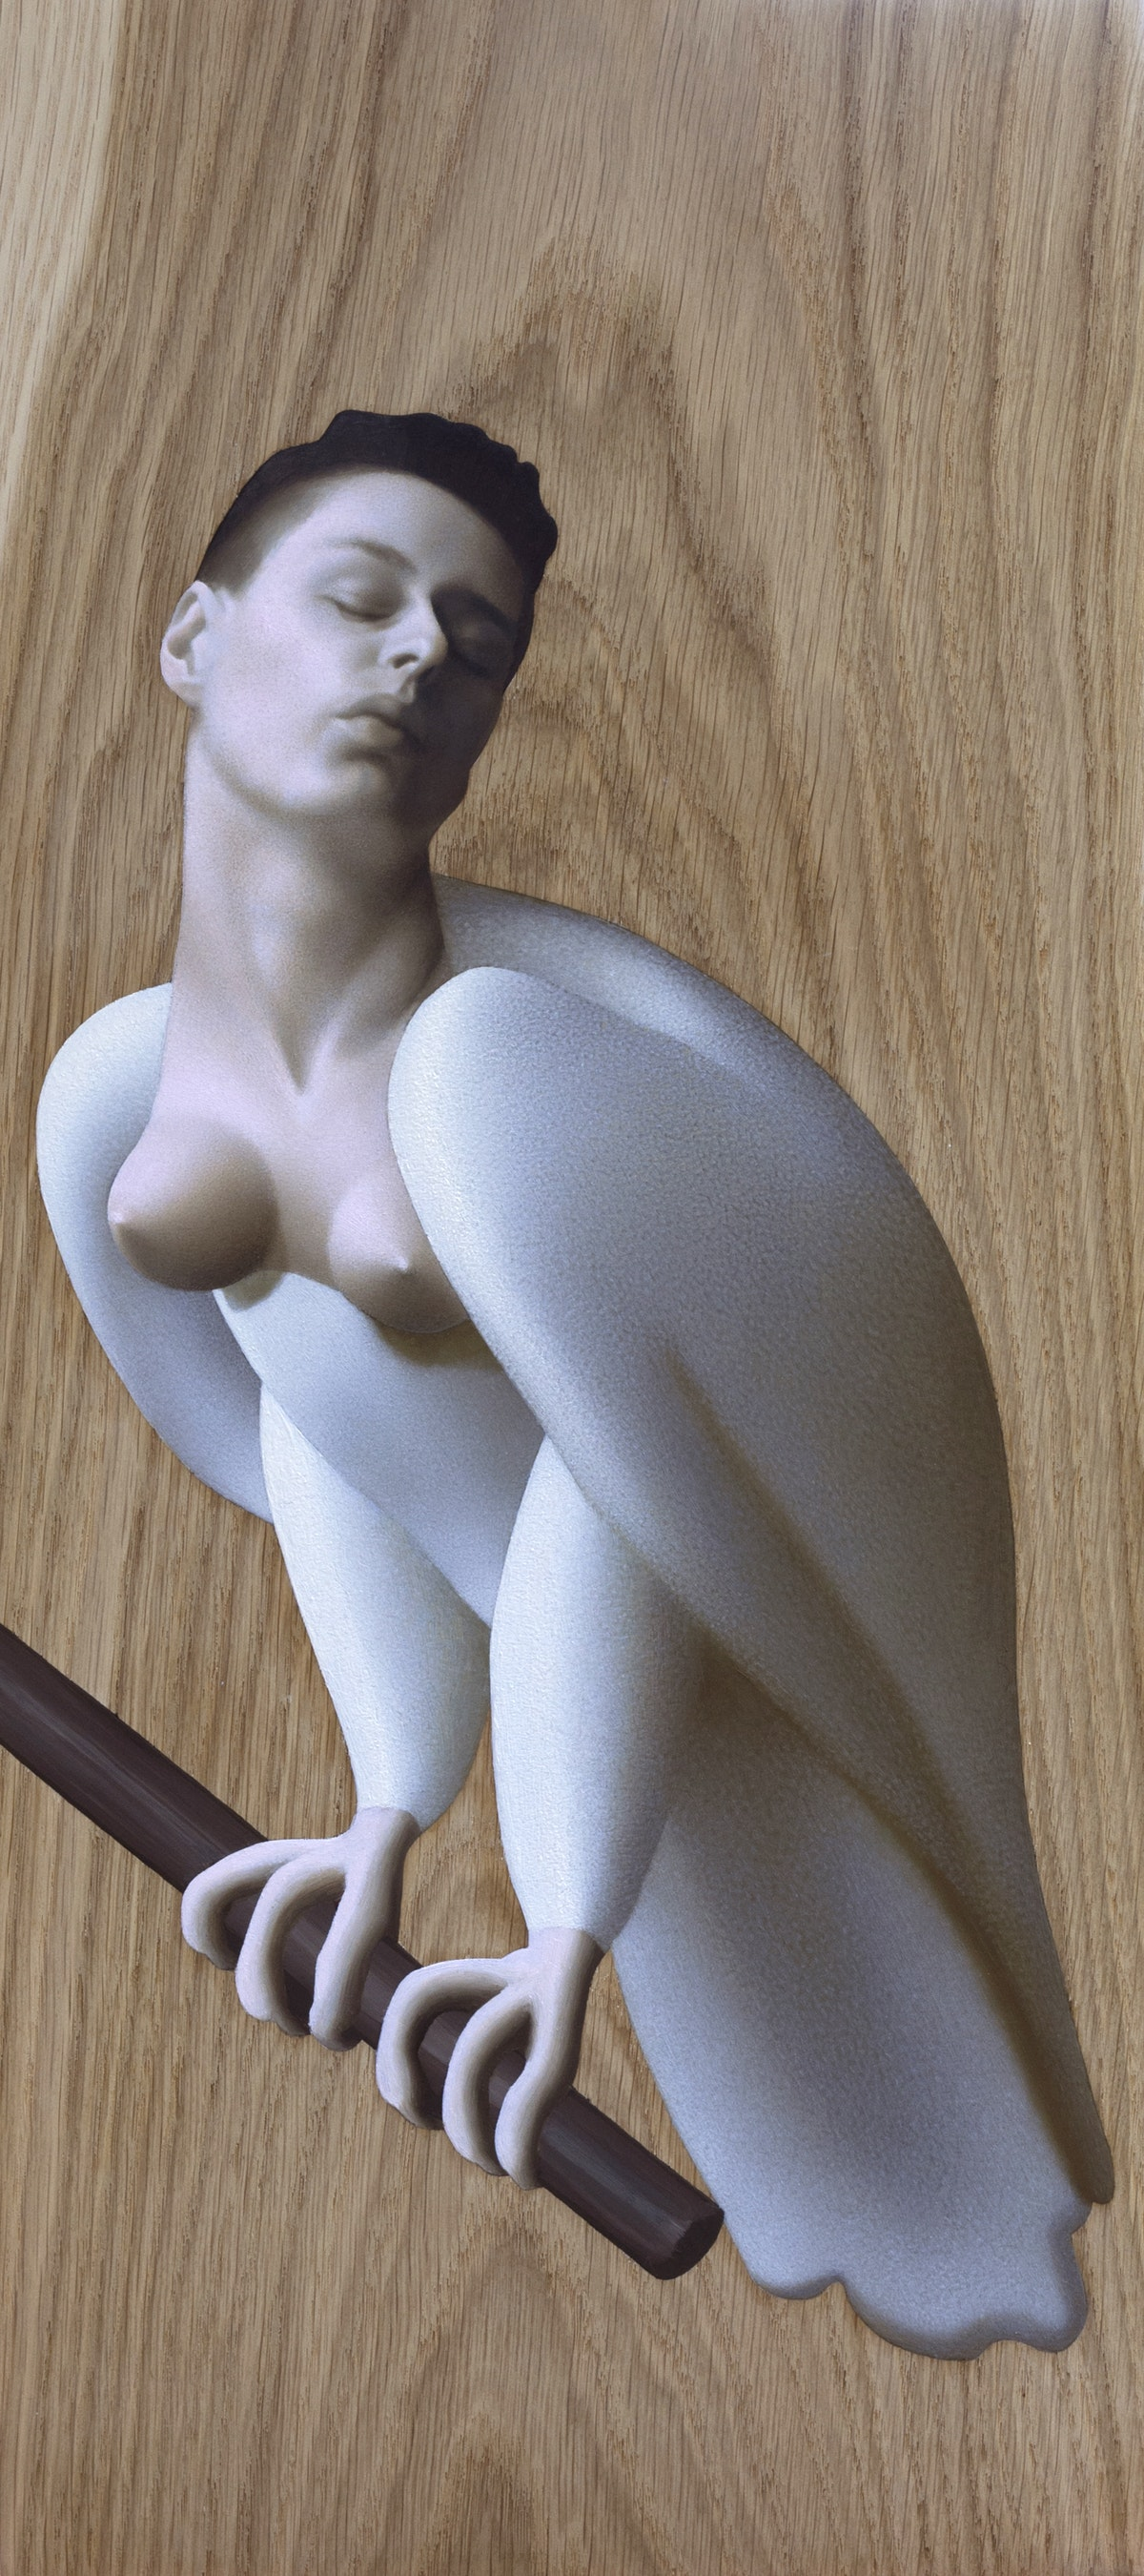 5 Kle Mens, Harpia, olej na desce, 24 x 54 cm, 2019